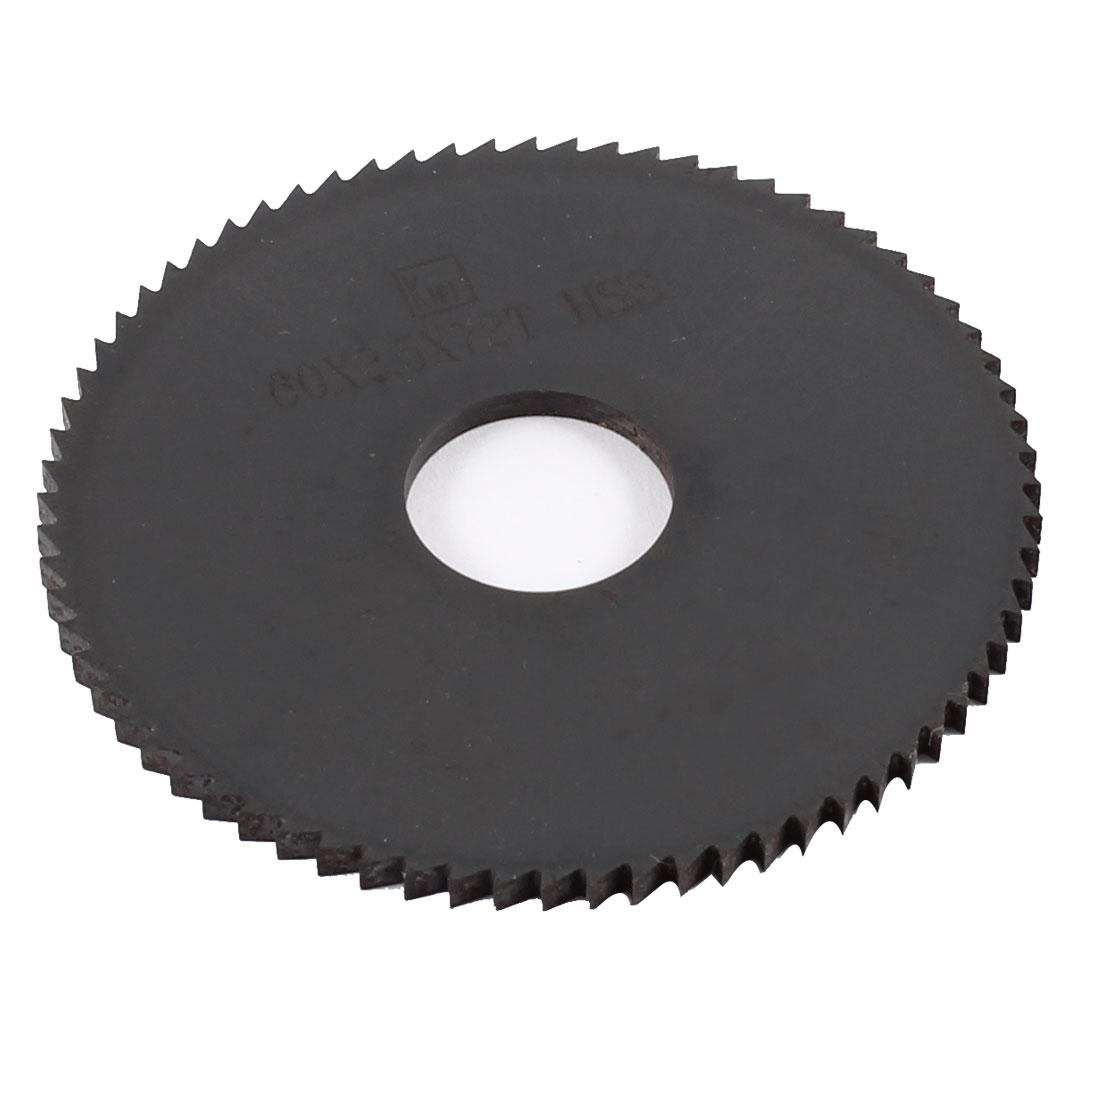 60mm x 2.5mm x 16mm Milling Cutter HSS 72T Slitting Saw Blade Black